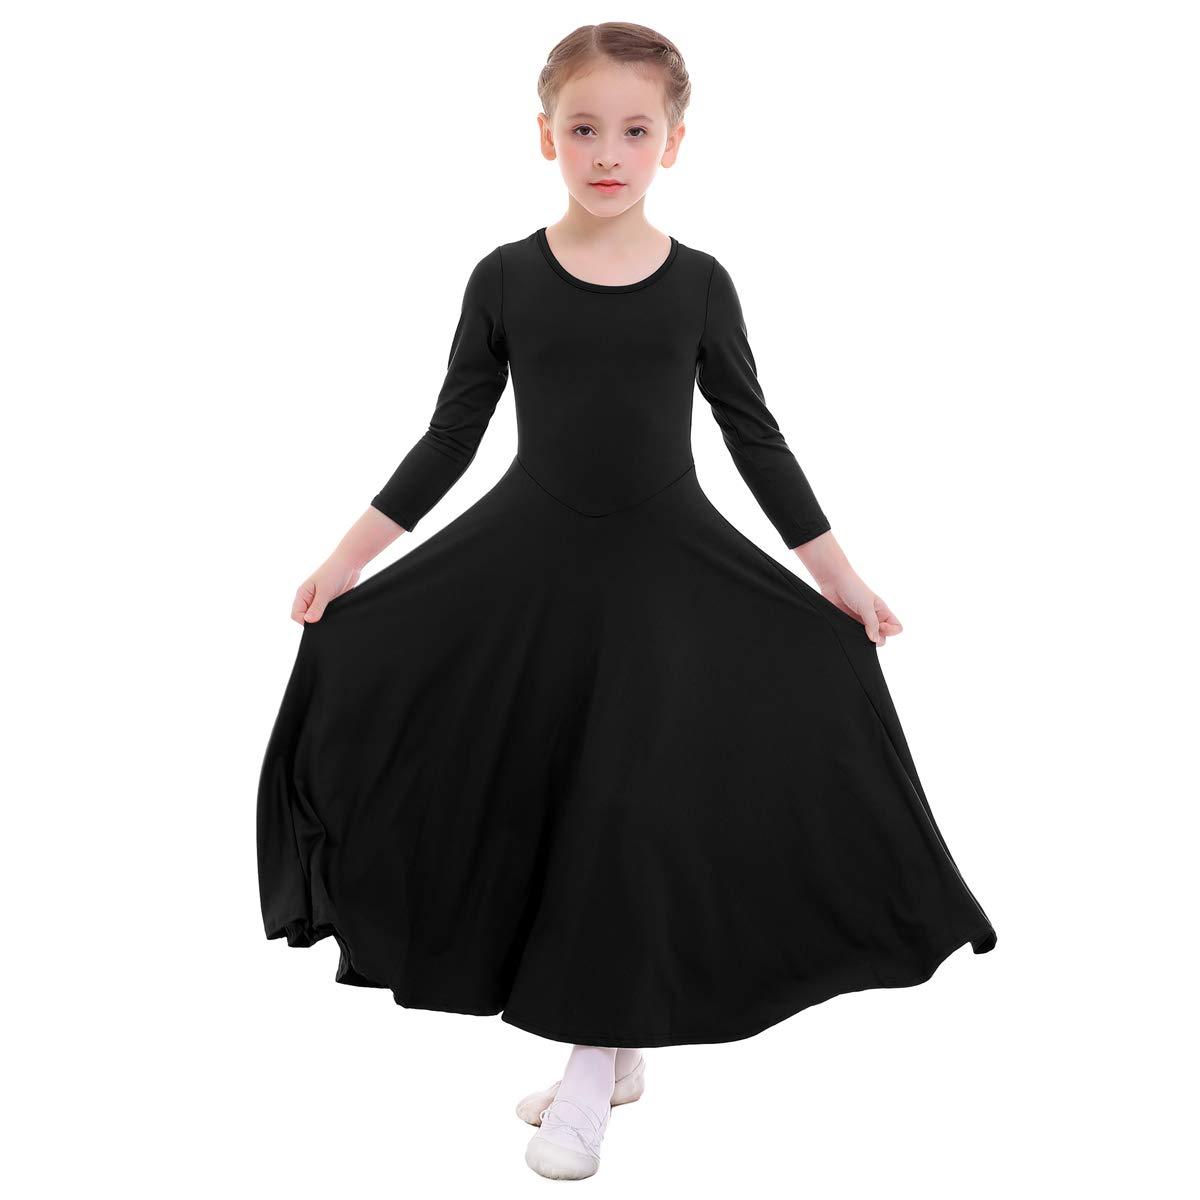 OwlFay DRESS ガールズ B07DBVFTHX 7-8 Years|ブラック ブラック 7-8 Years